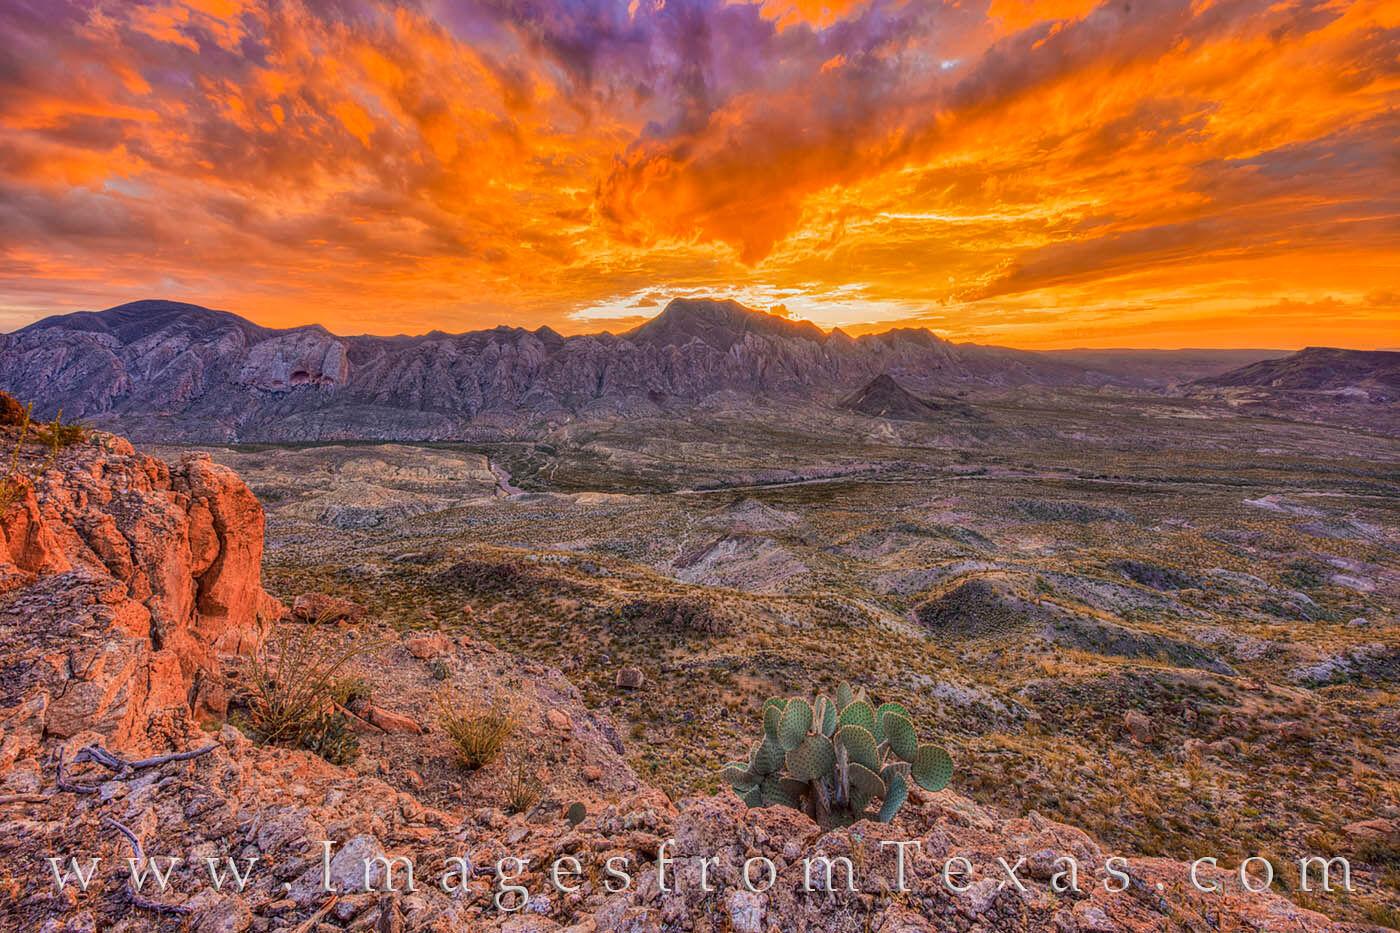 fresno canyon, solitario, hiking, big bend ranch, fresno rim, presidio, brewster, dirt road, west texas, sunrise, beautiful, sky, photo